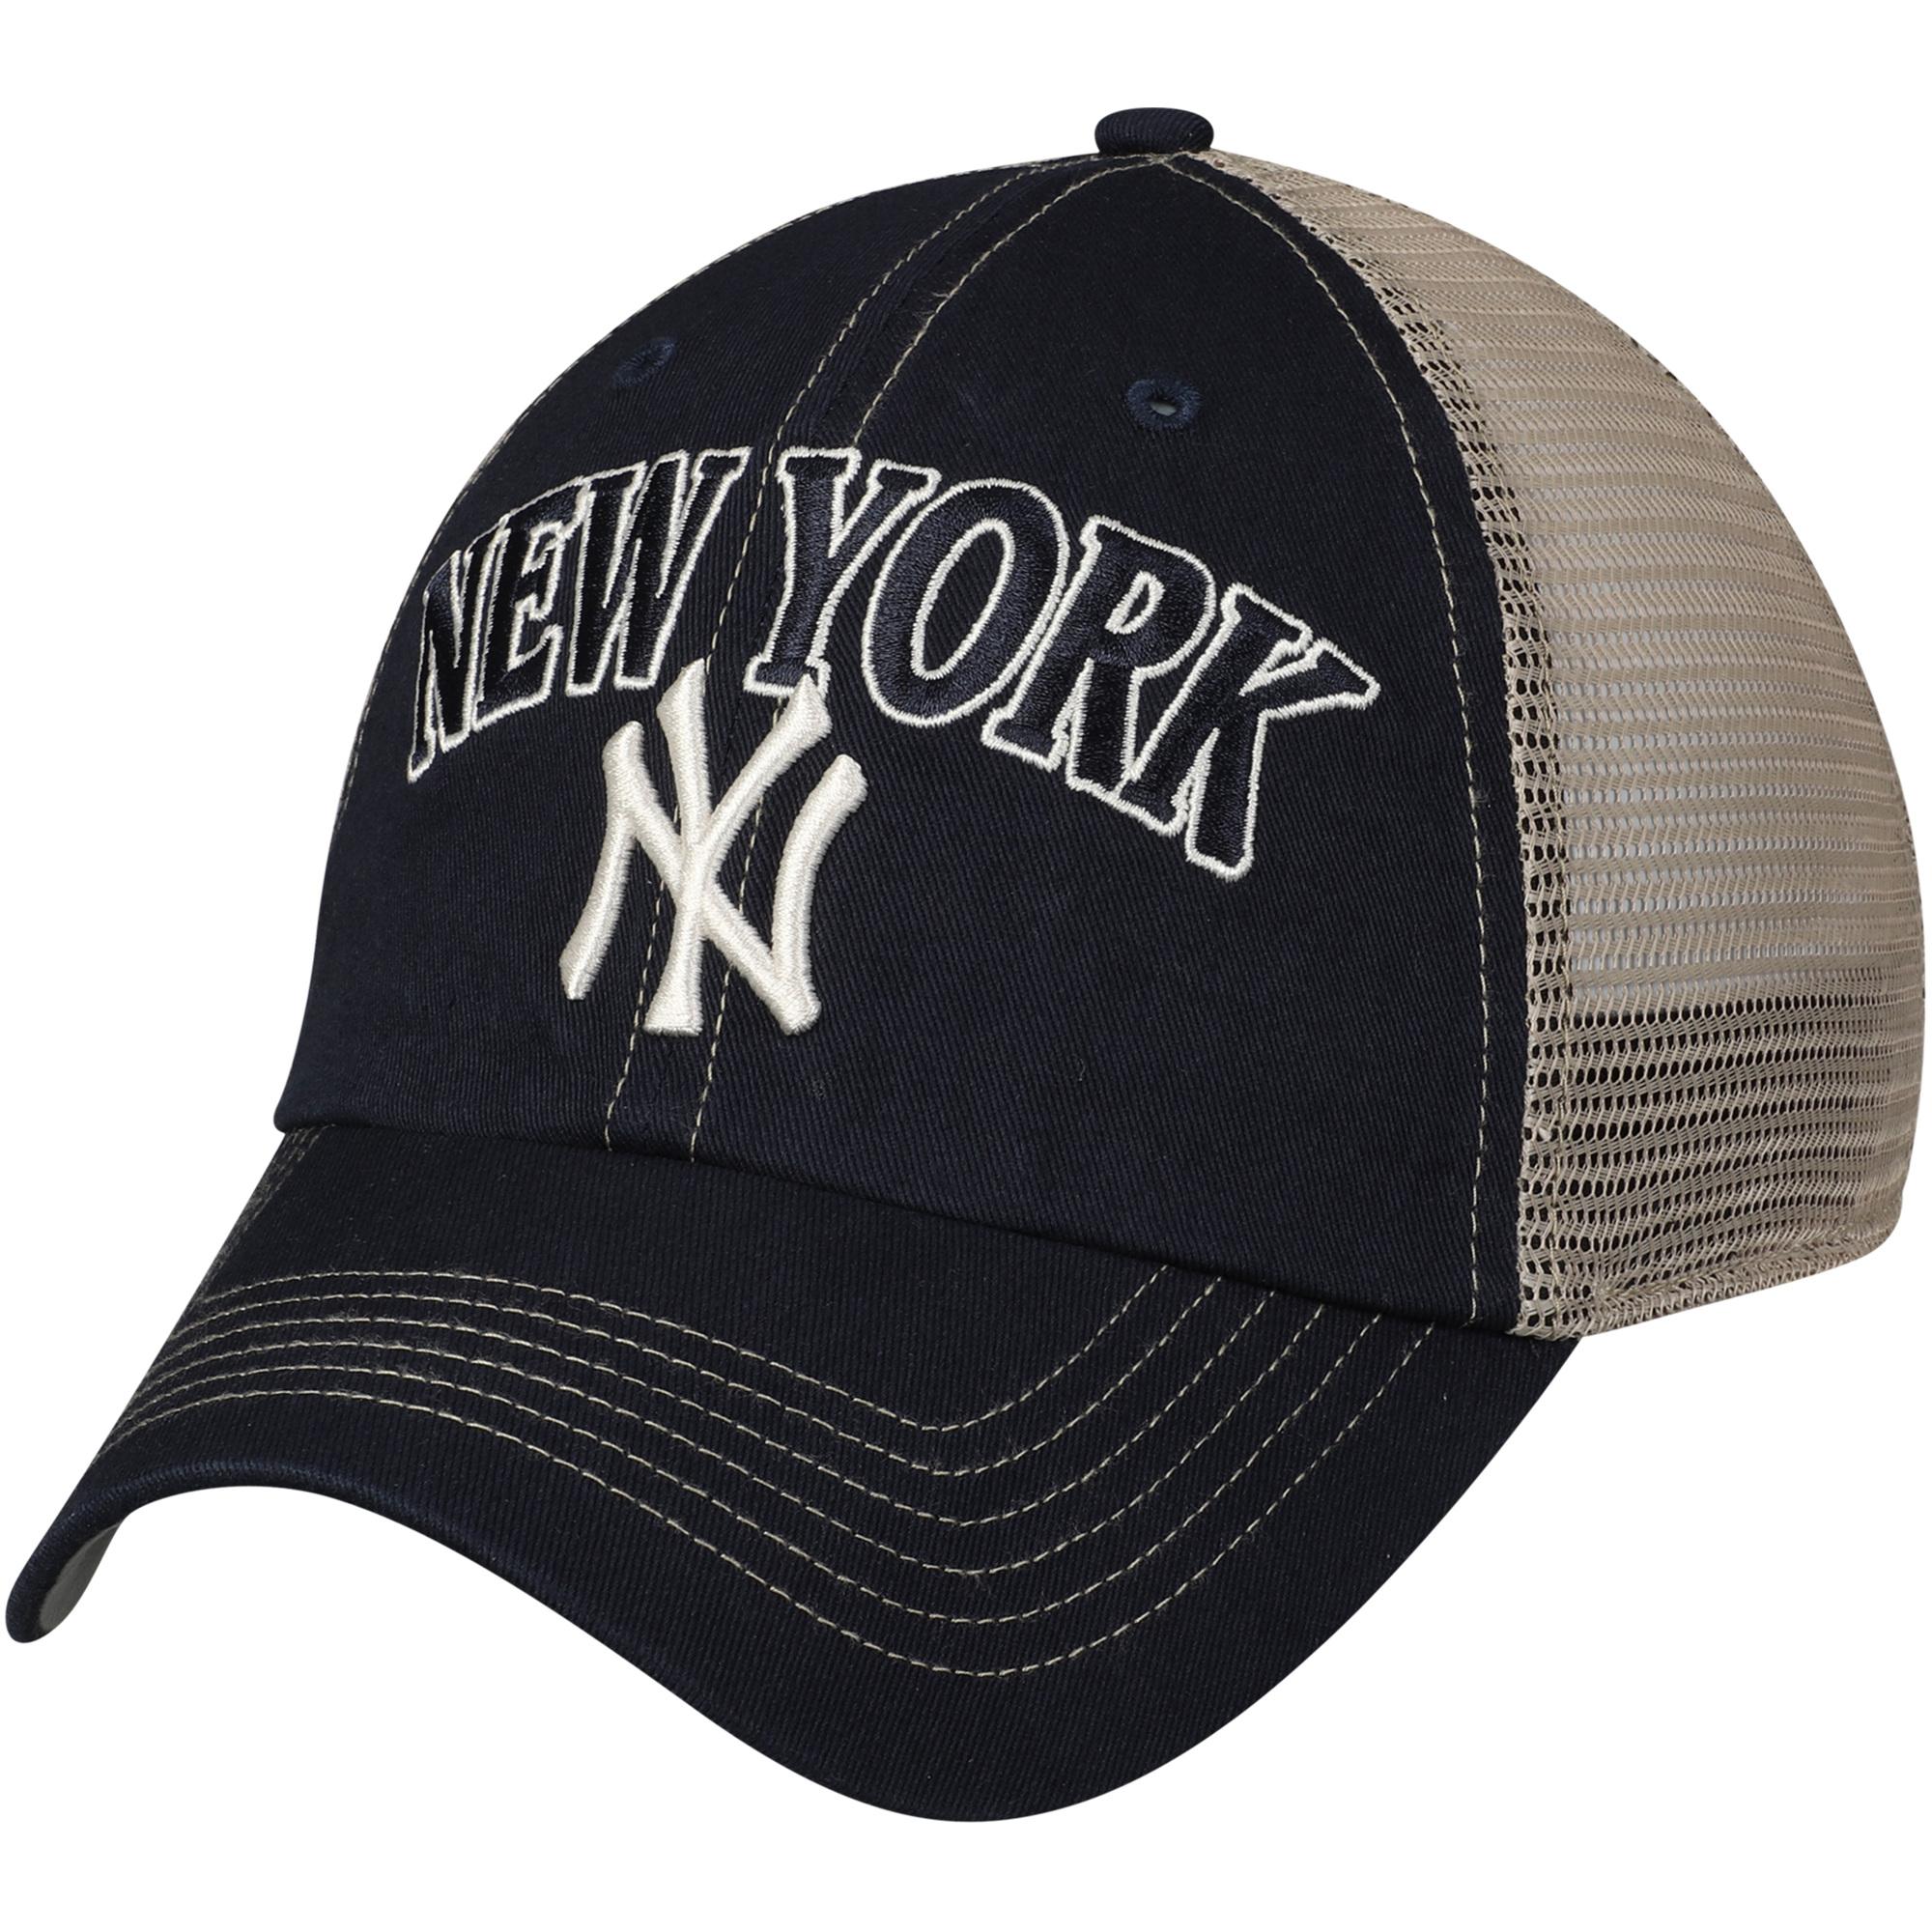 MLB New York Yankees Aliquippa Adjustable Cap/Hat by Fan Favorite